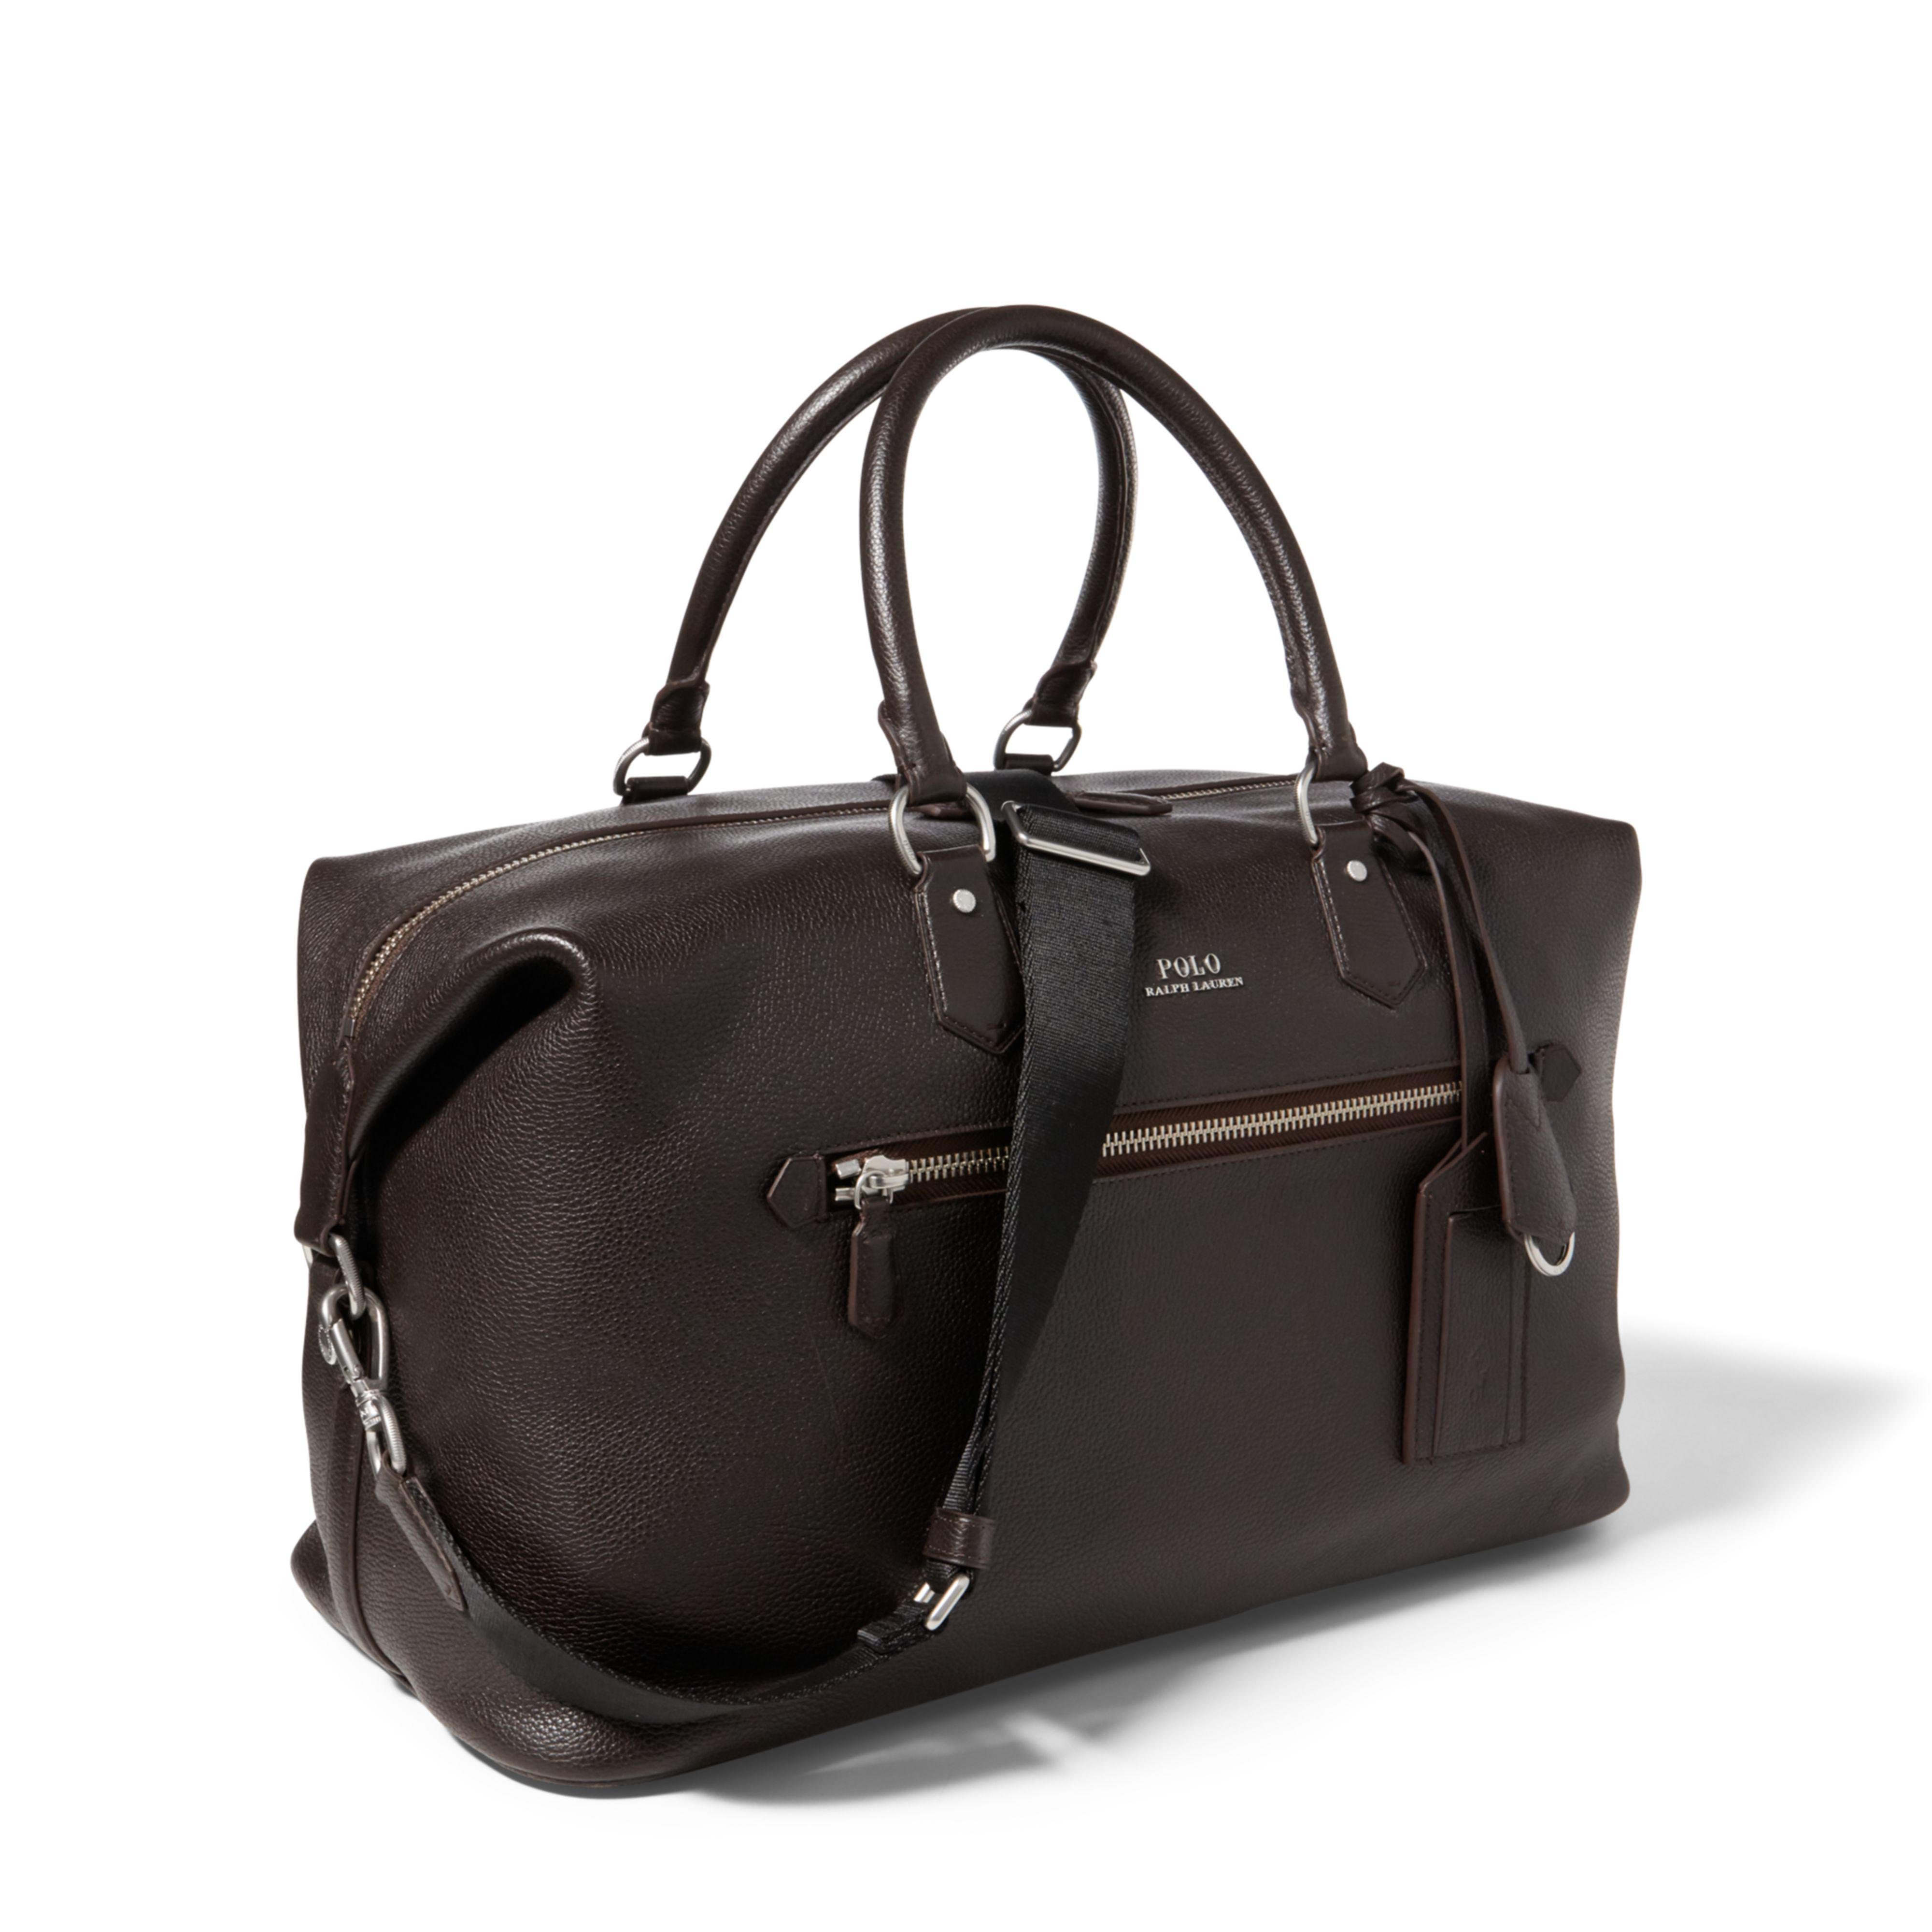 ffec47a9a7 ... shop polo ralph lauren brown pebbled leather duffel bag lyst. view  fullscreen 3d804 ffc1b